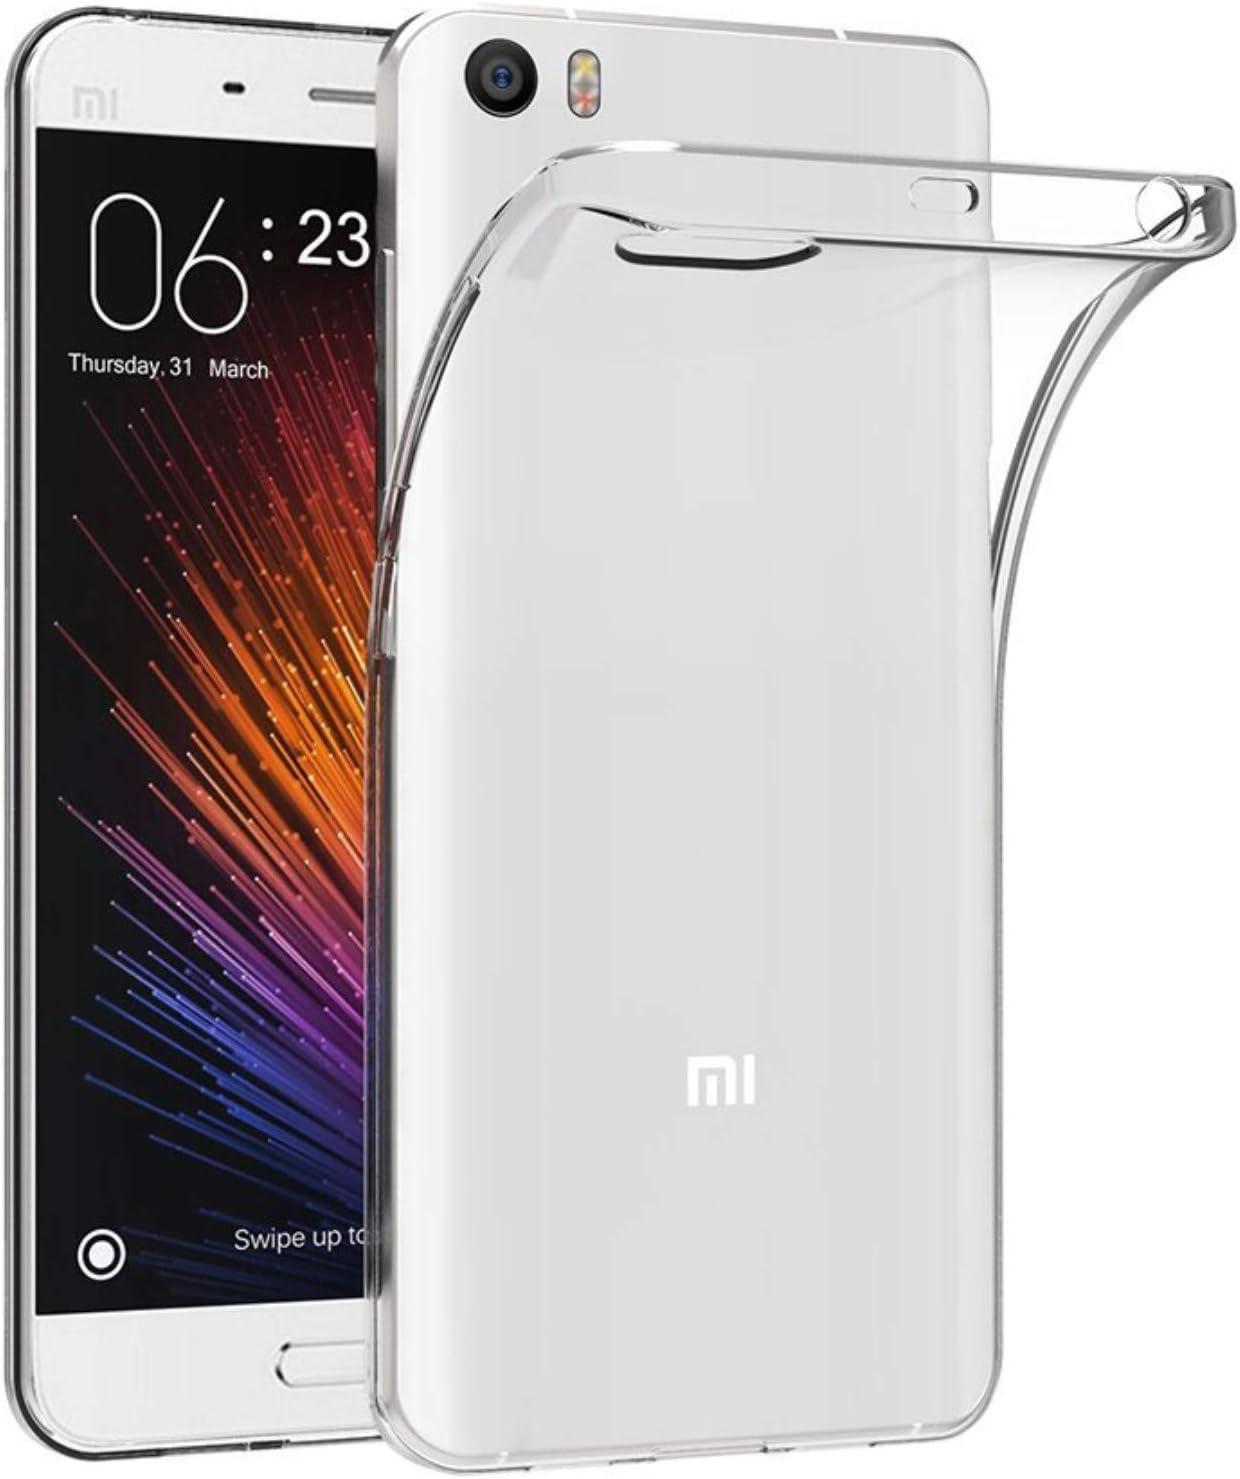 Todotumovil Funda de Gel TPU Carcasa Protectora Silicona para Xiaomi MI5 Transparente